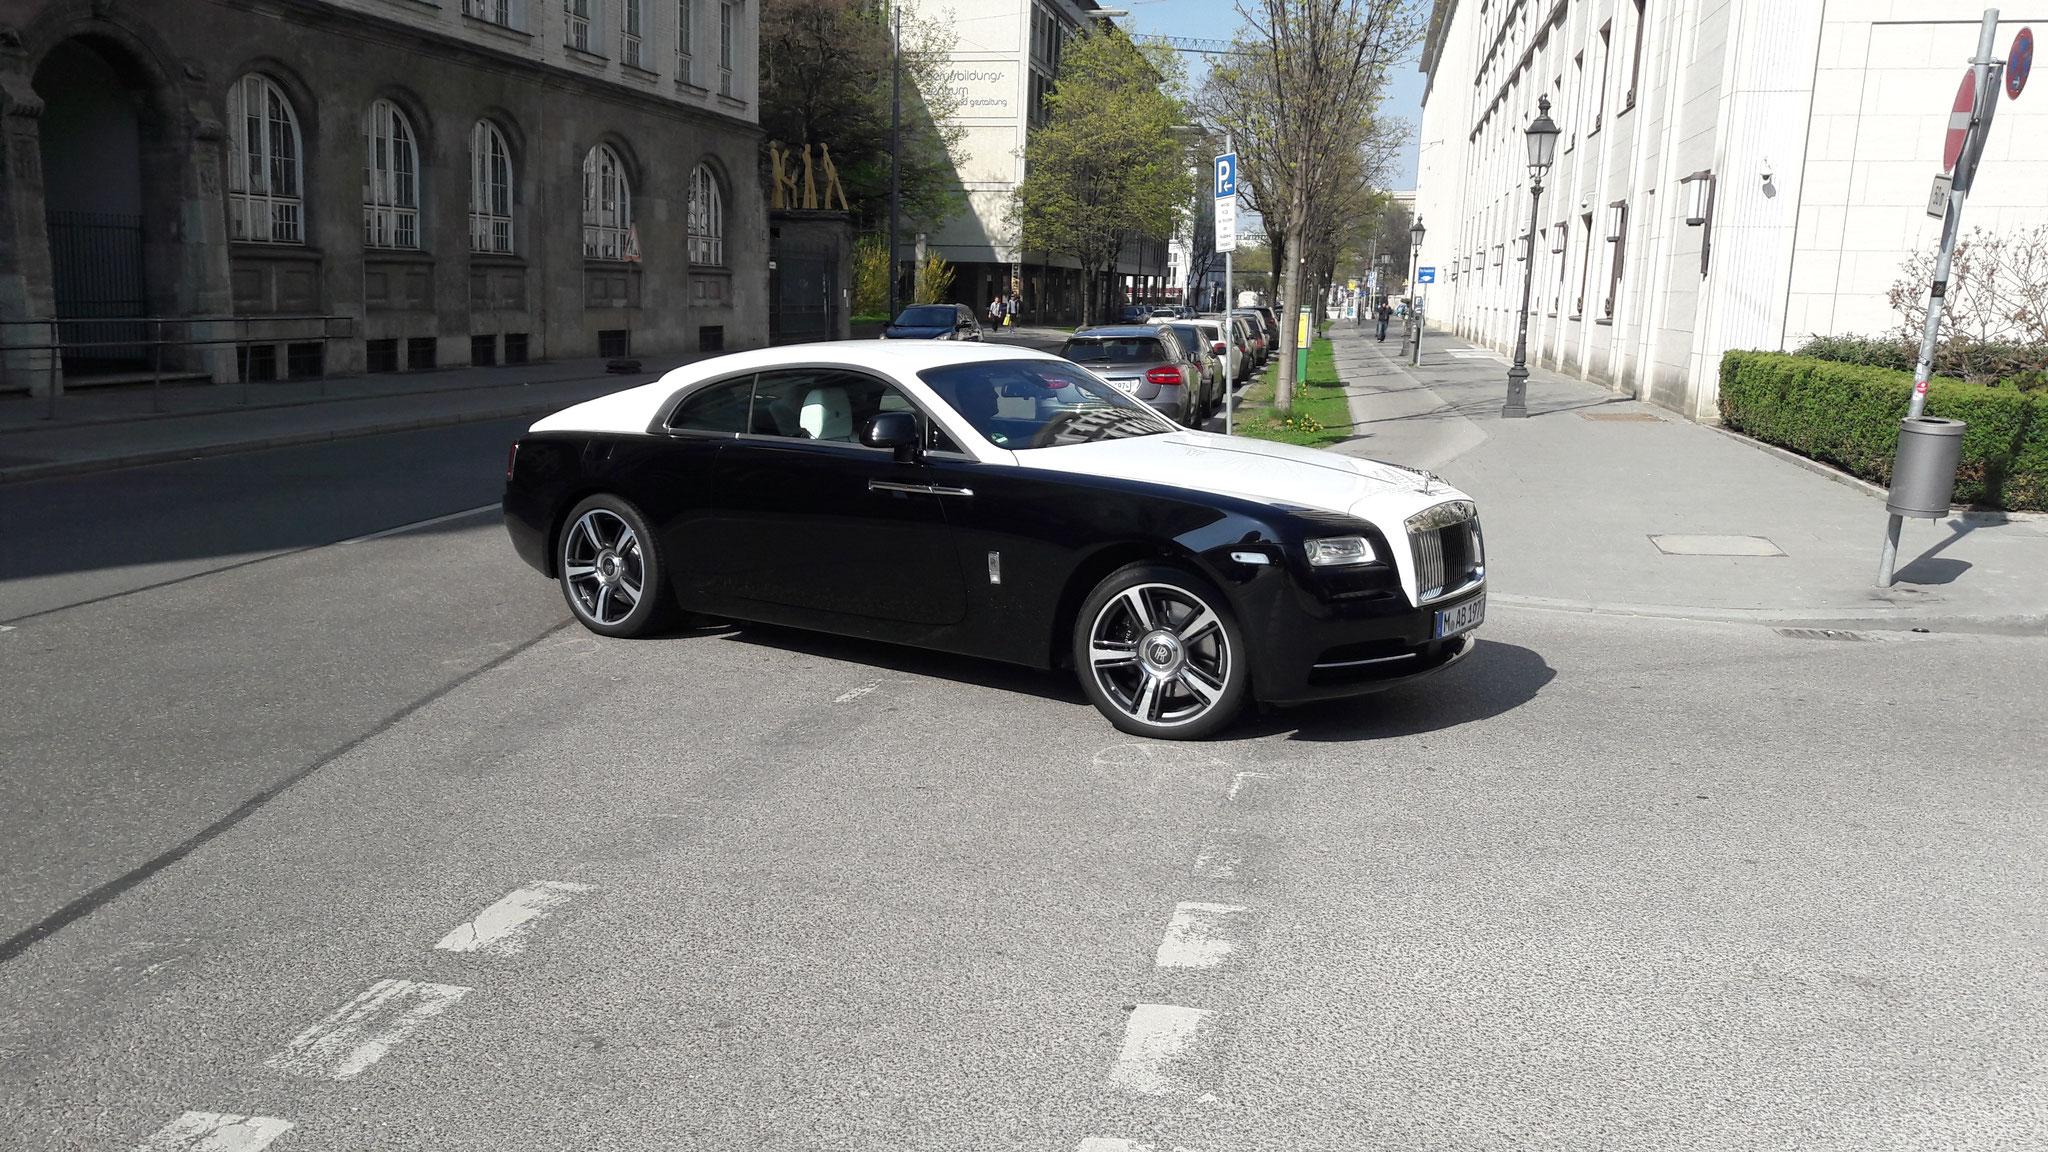 Rolls Royce Wraith - M-AB-1970